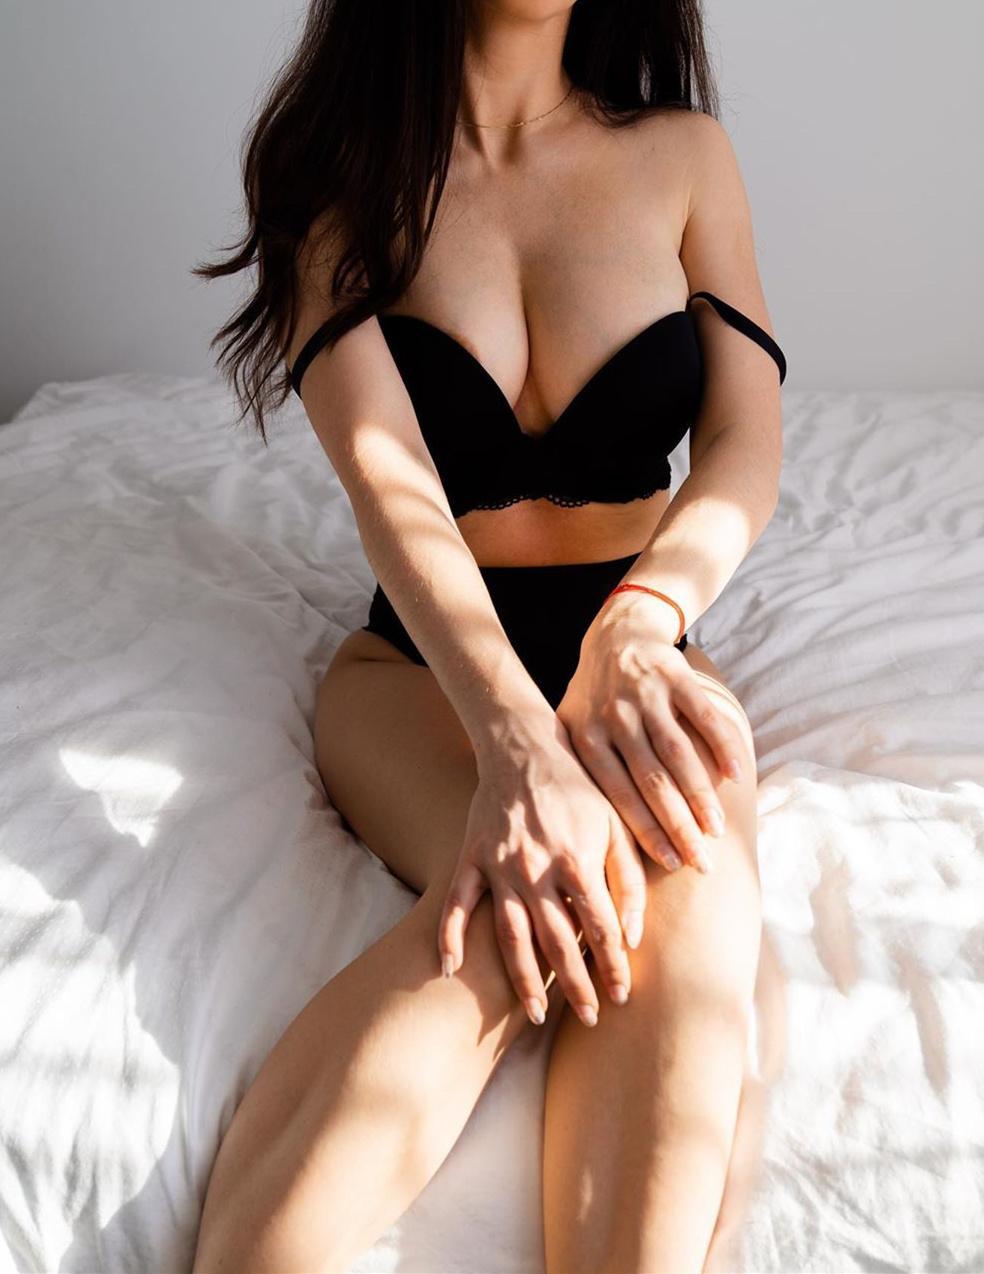 tma美国暗黑女神Tinna Angel,性感丝袜翘臀什么都可以蠢蠢欲动-福利巴士